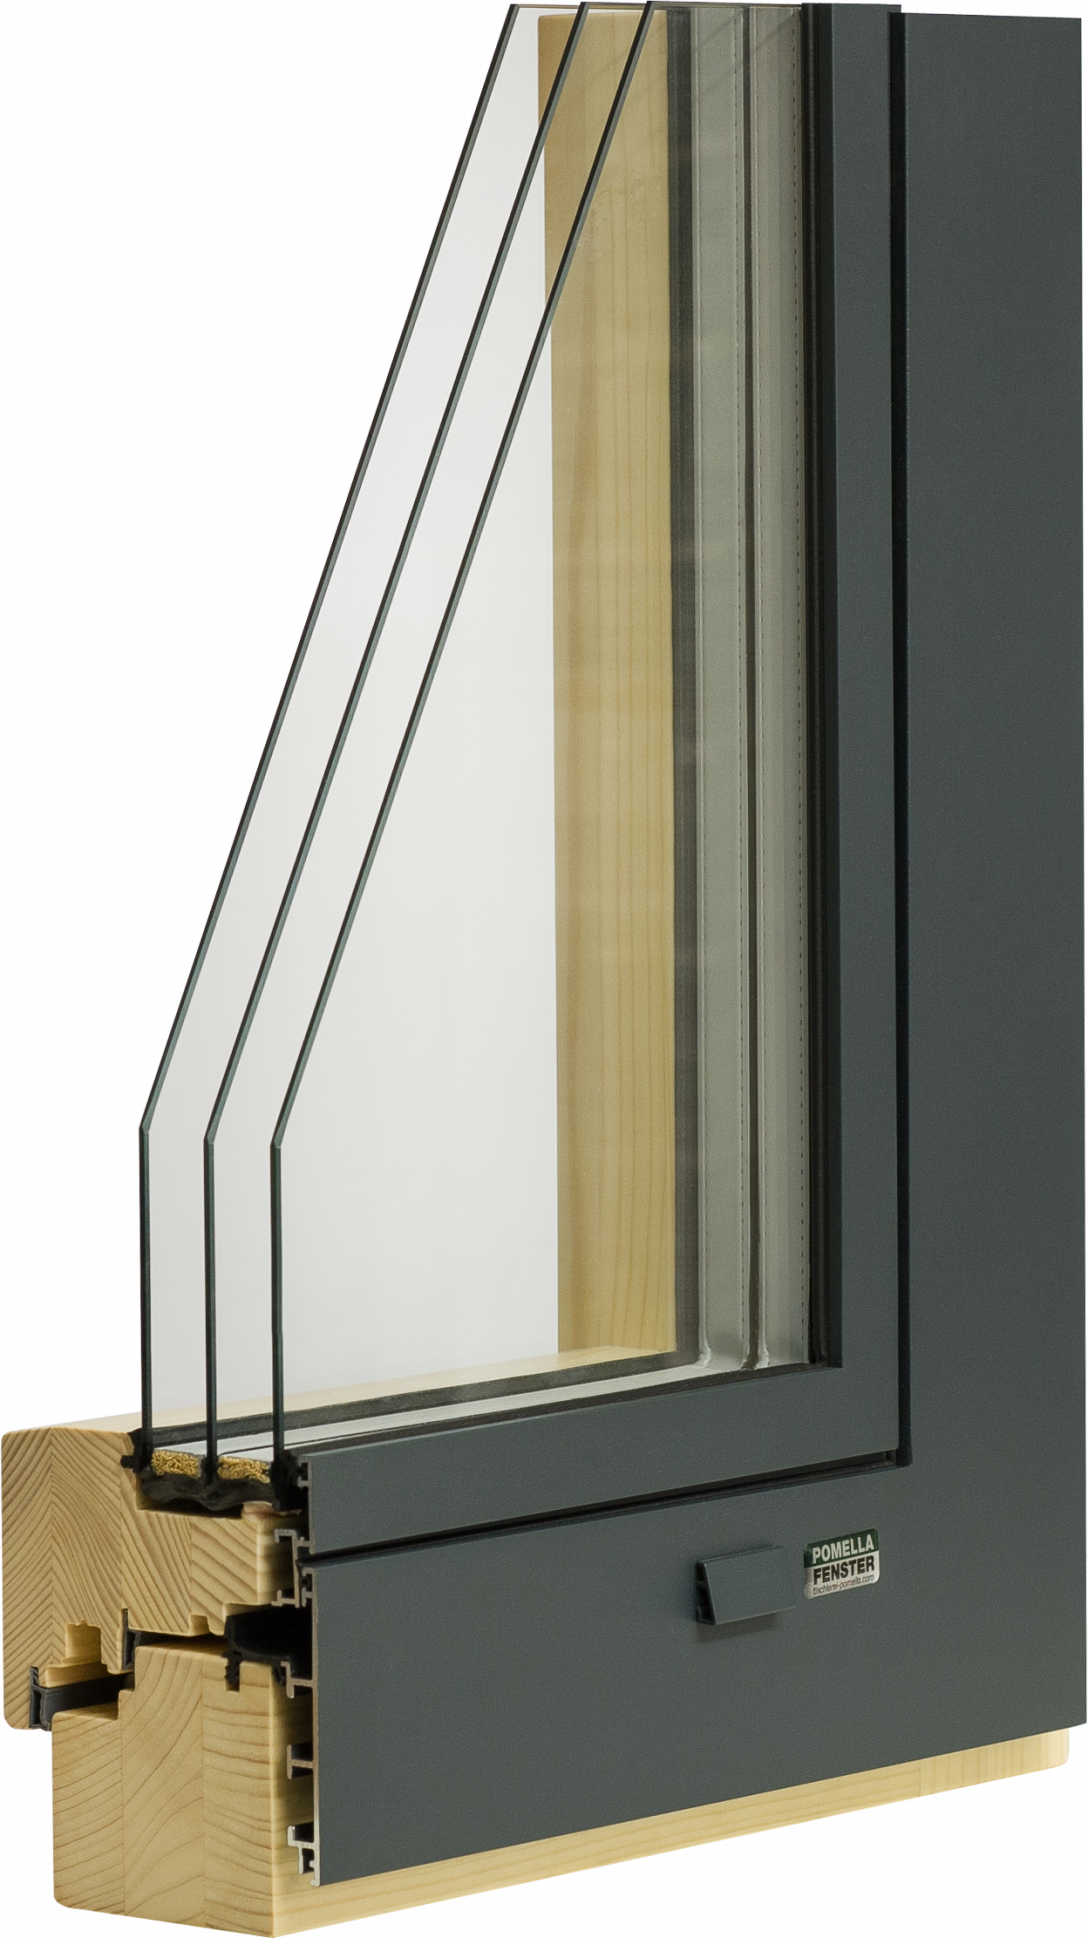 Large Size of Holz Aluminium Fenster Preisliste Alu Preisvergleich Preis Leistung Unilux Preisunterschied Josko Preise Pro Qm Mit 3 Fach Verglasung Auen Flchenbndig Fenster Holz Alu Fenster Preise